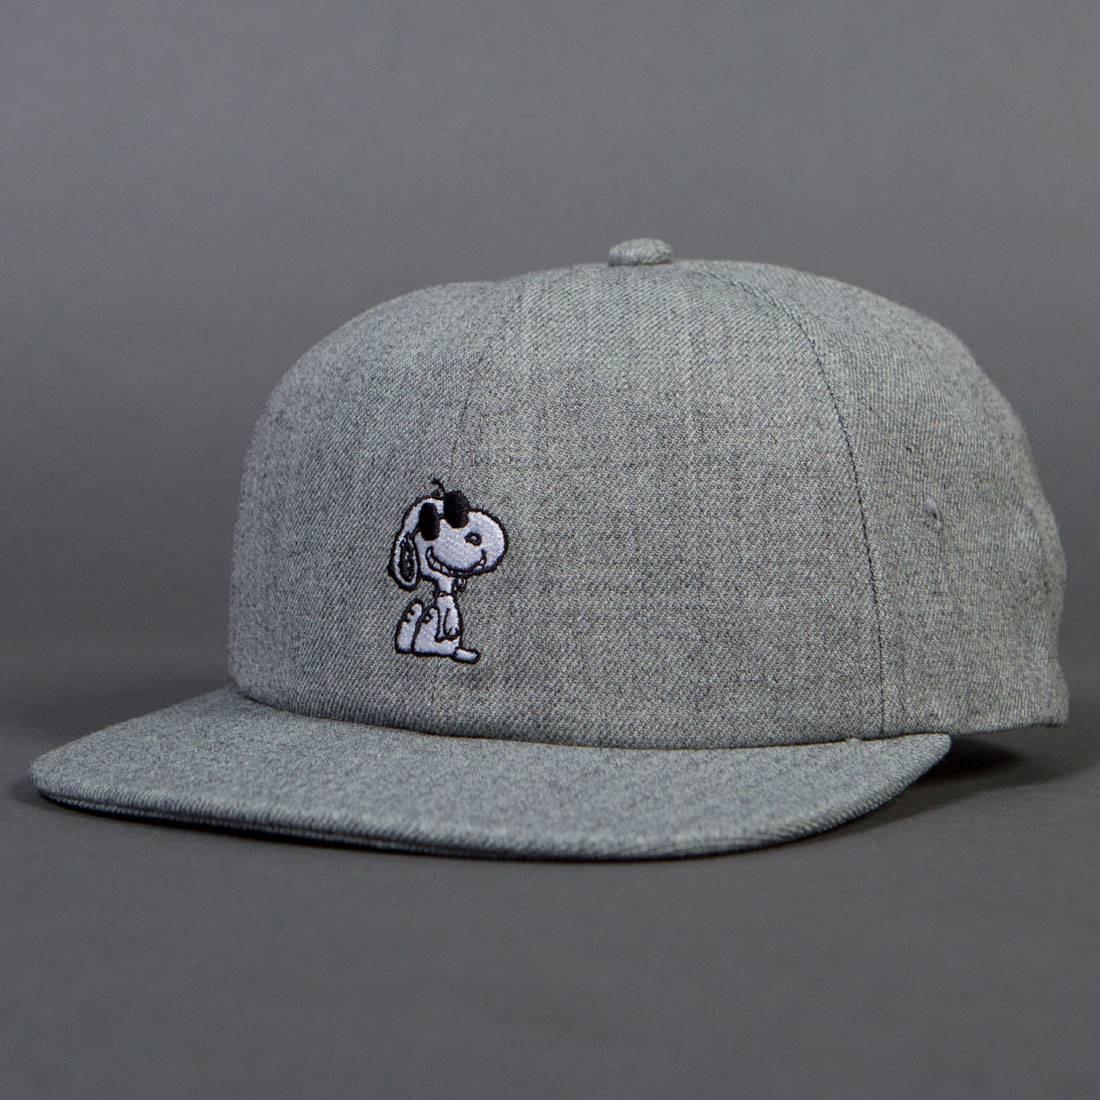 Vans x Peanuts Snoopy Jockey Cap gray heather 61310609d7ab